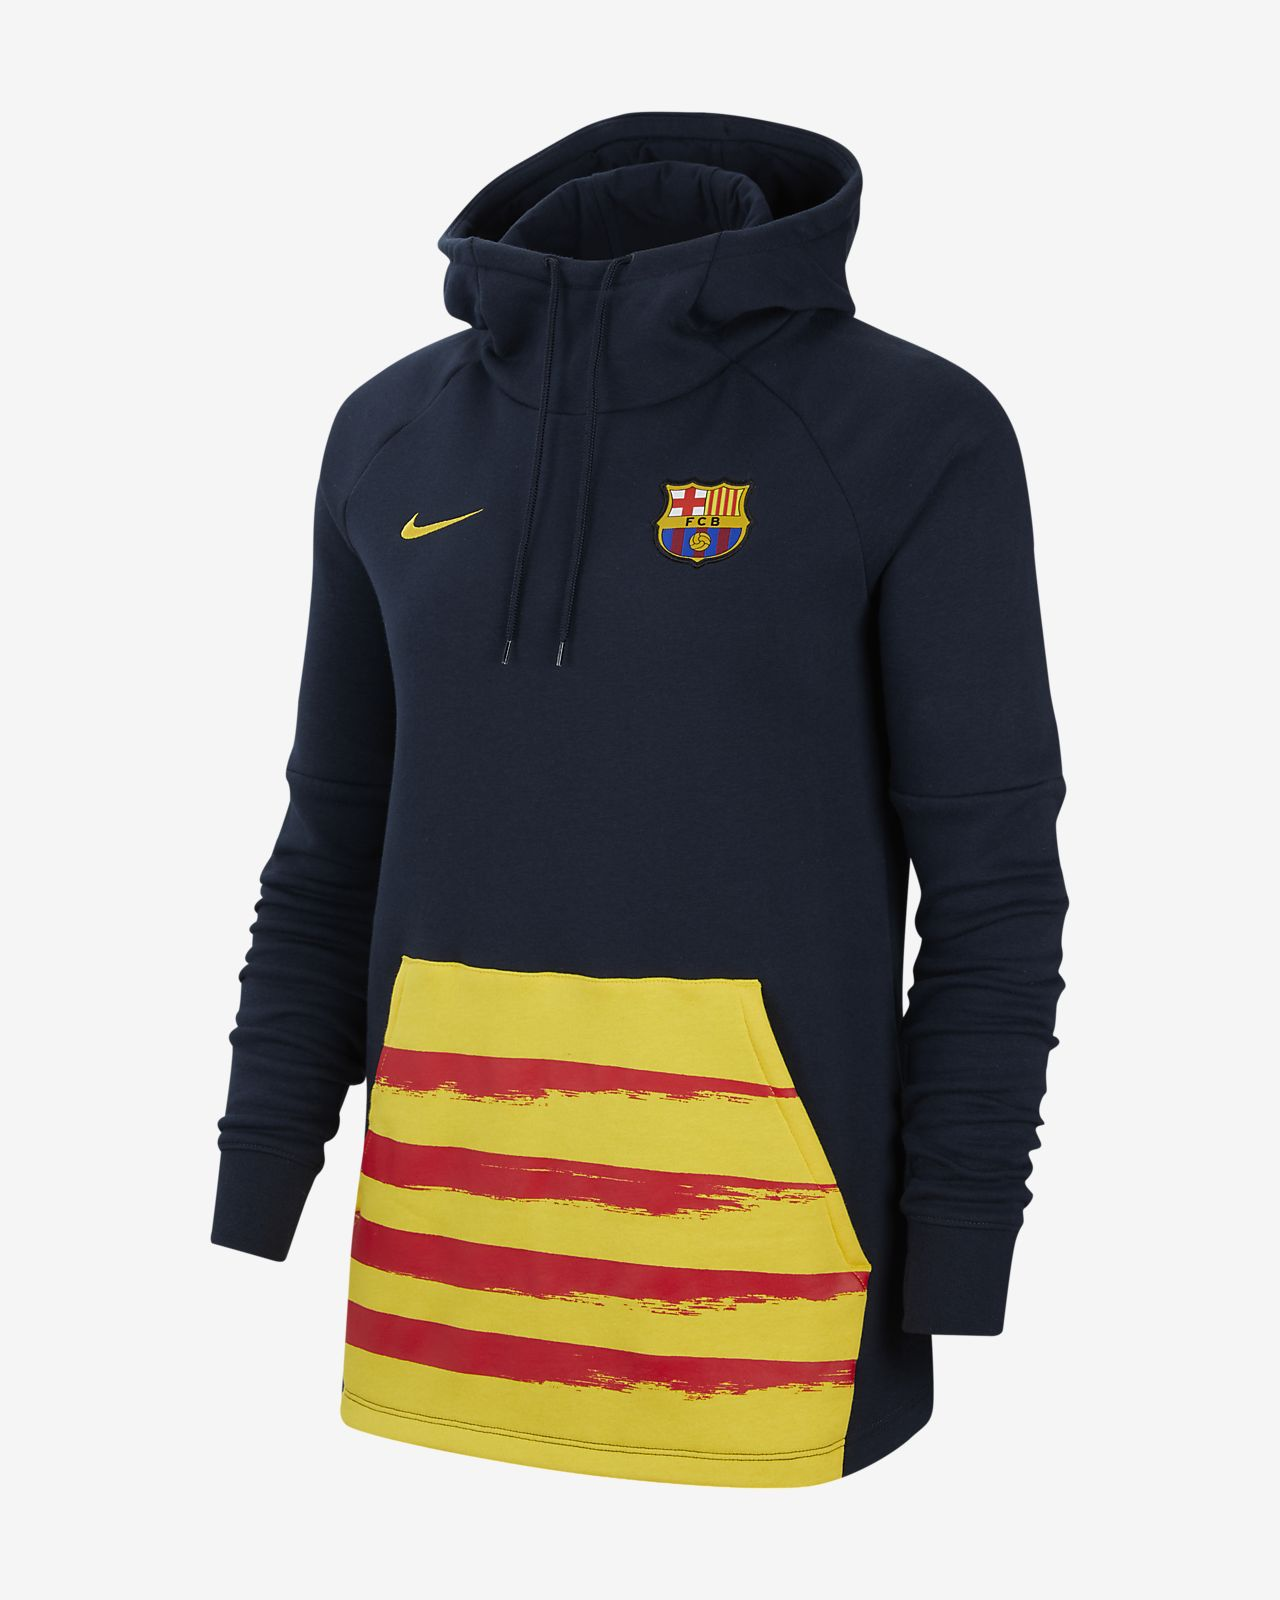 Hoodie pullover de futebol de lã cardada FC Barcelona para mulher